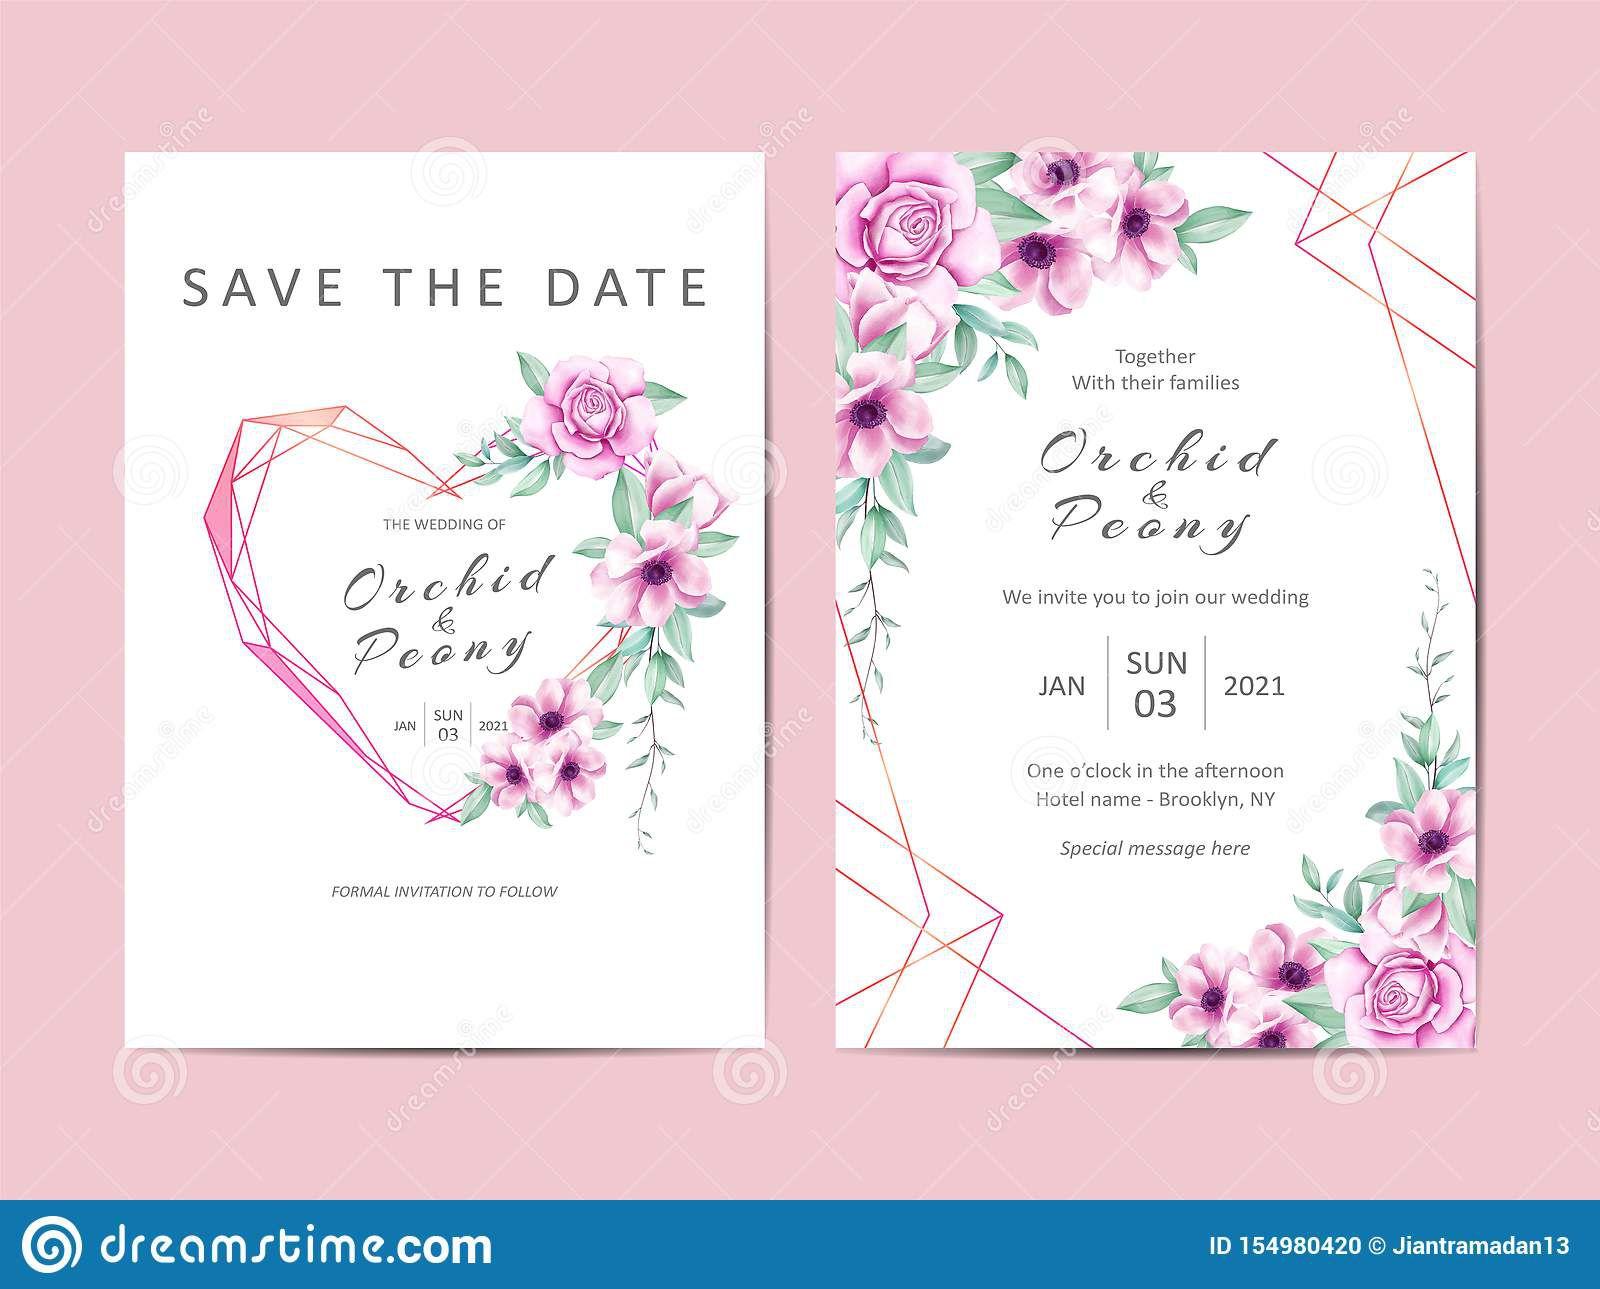 003 Singular Editable Wedding Invitation Template Photo  Templates Tamil Card Free Download Psd OnlineFull